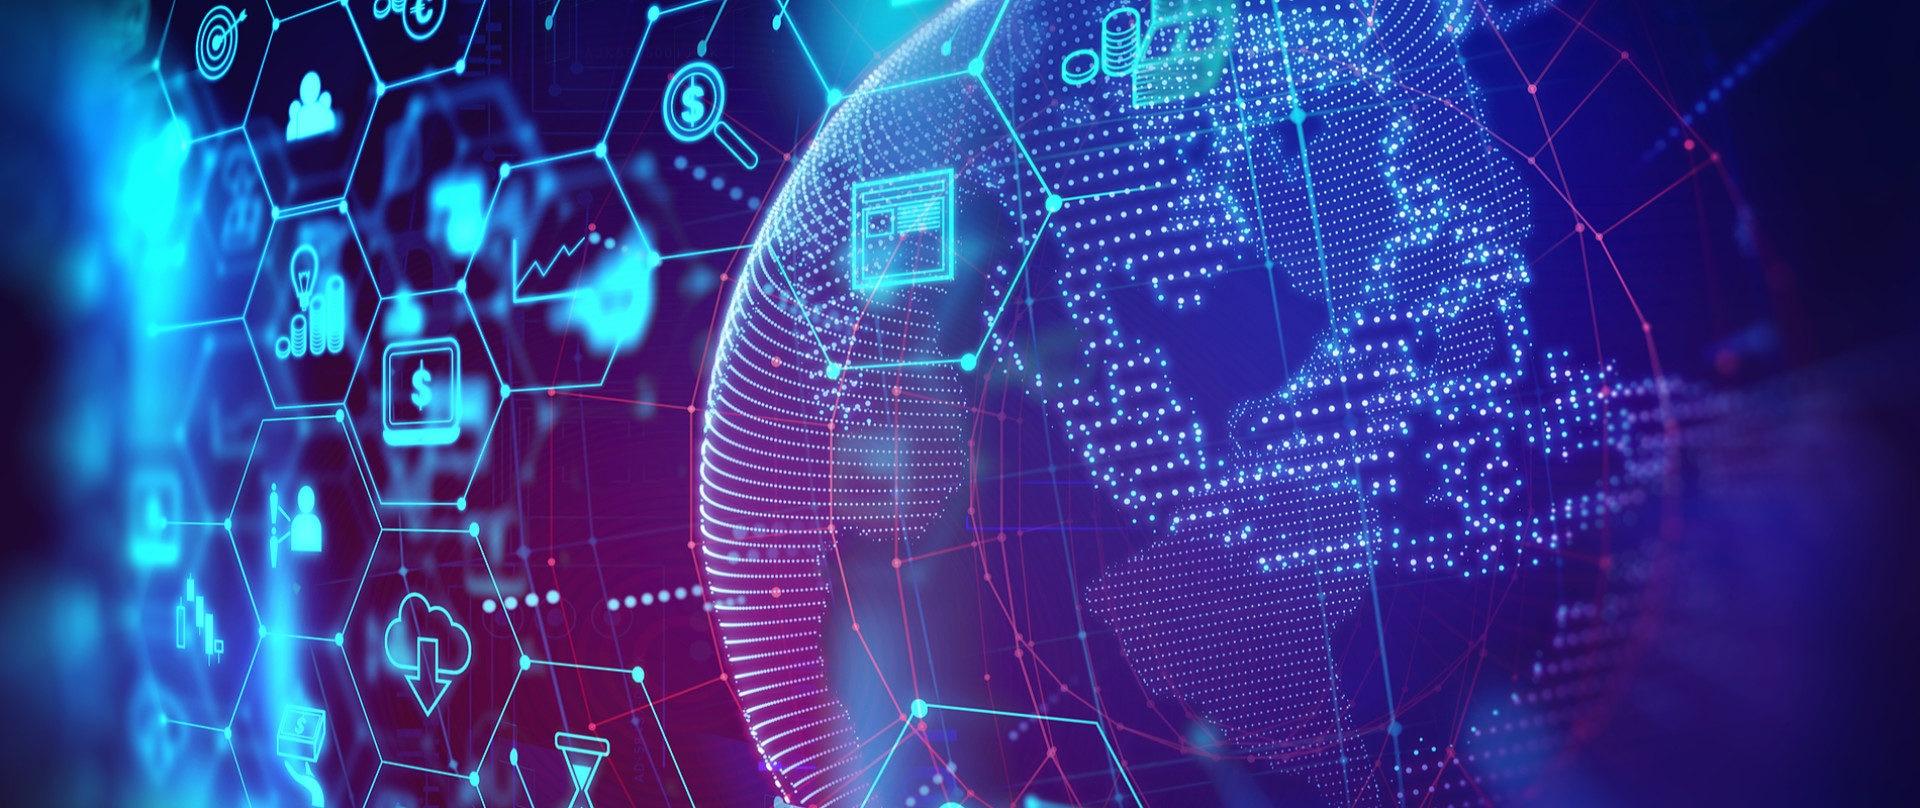 fintech-tecnologia-innovacion-digital-bl